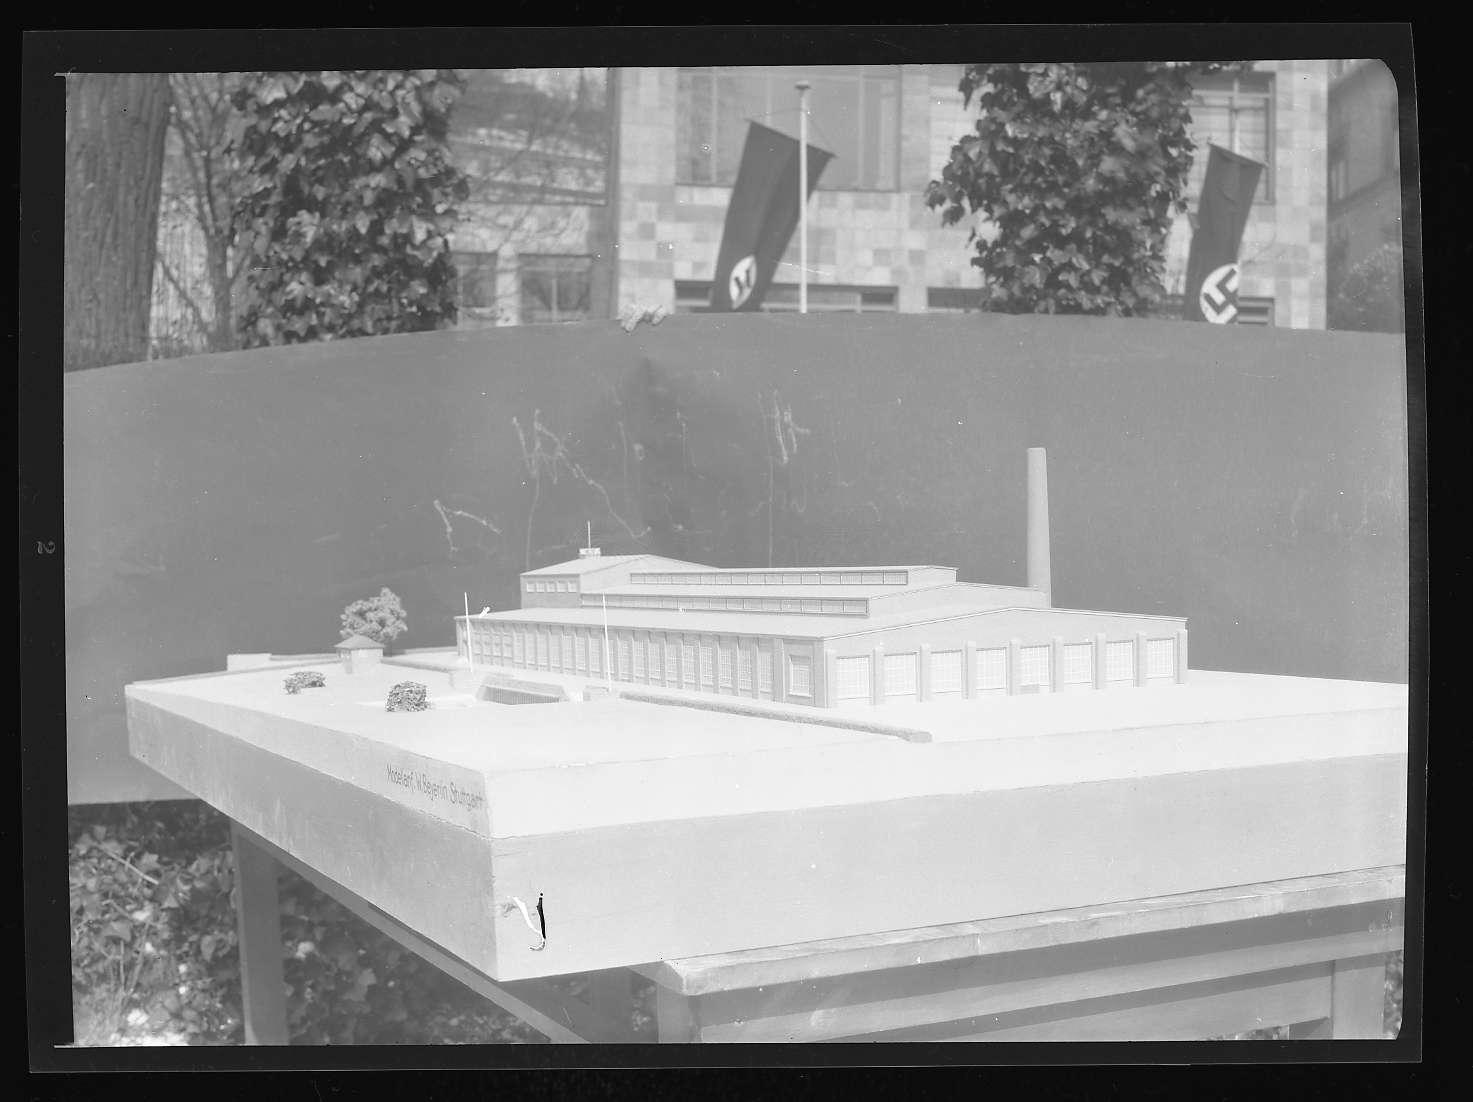 Kornwestheim, Zentralschmiede, Architekturmodell 3, Abb. b